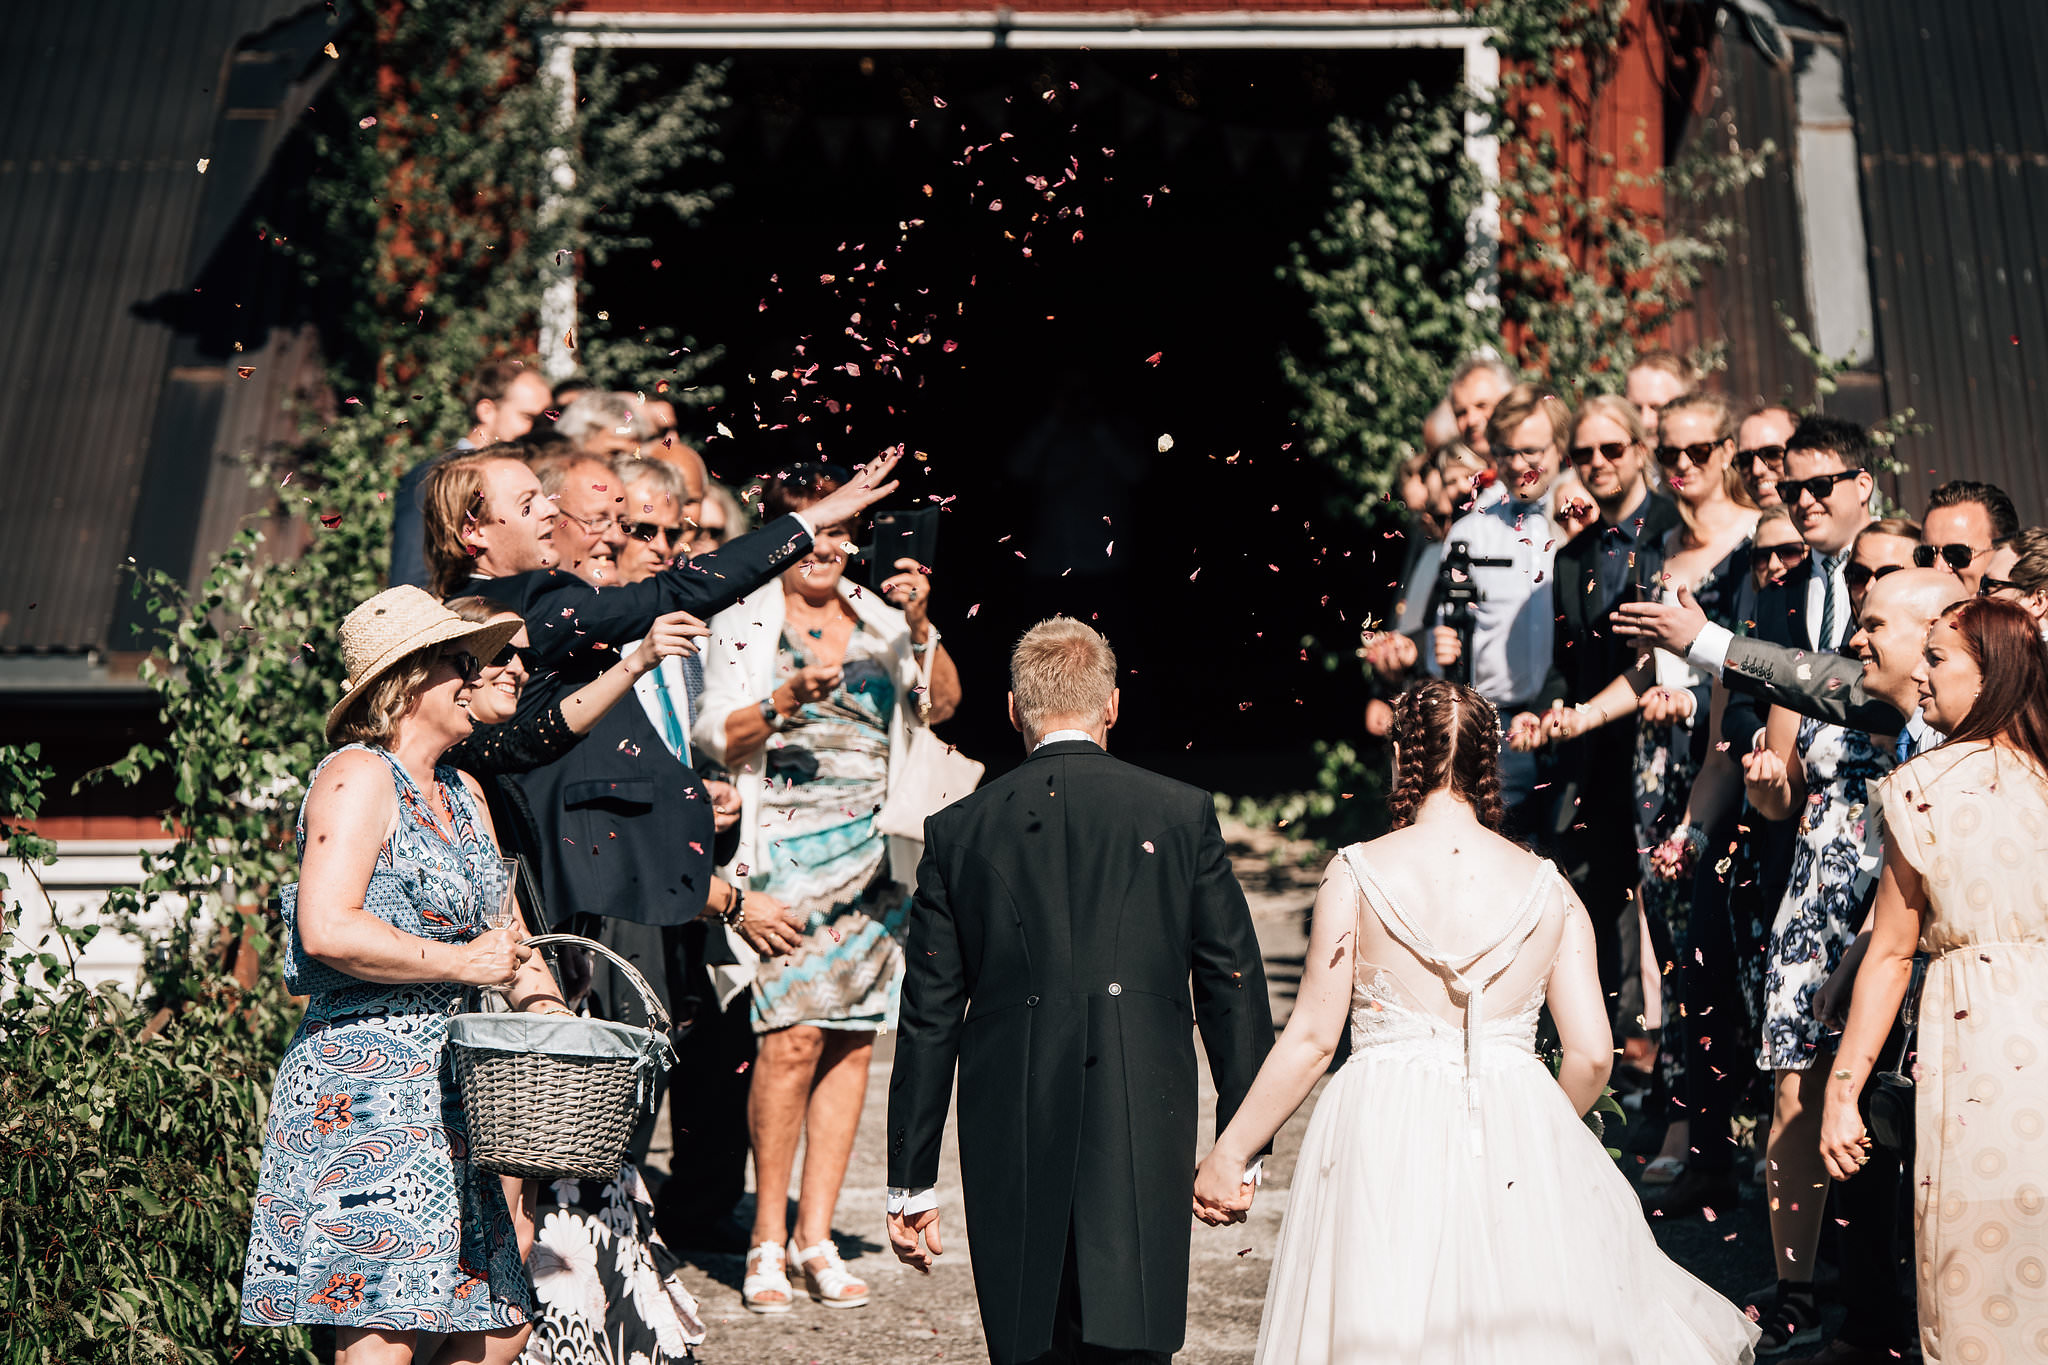 DSC_5668-fotograf-vestfold-bryllupsfotograf-.jpg